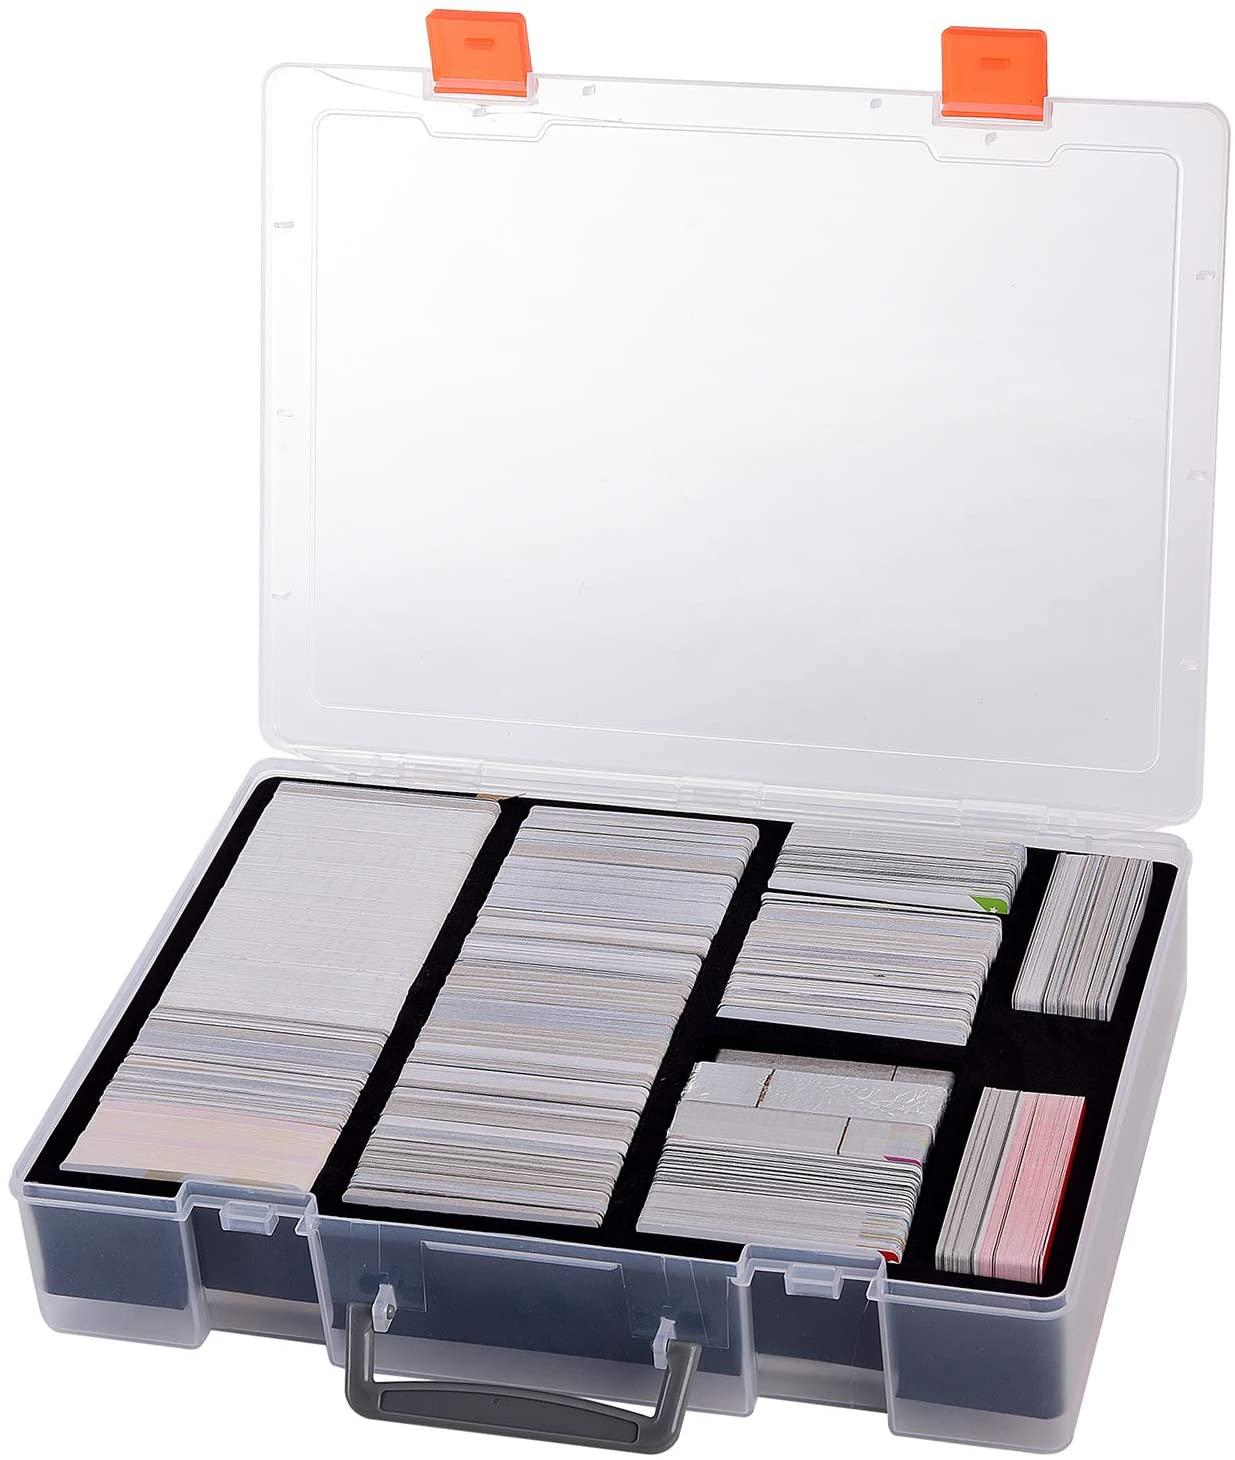 Large Card Deck Holder & Organizer - 2200 + Cards